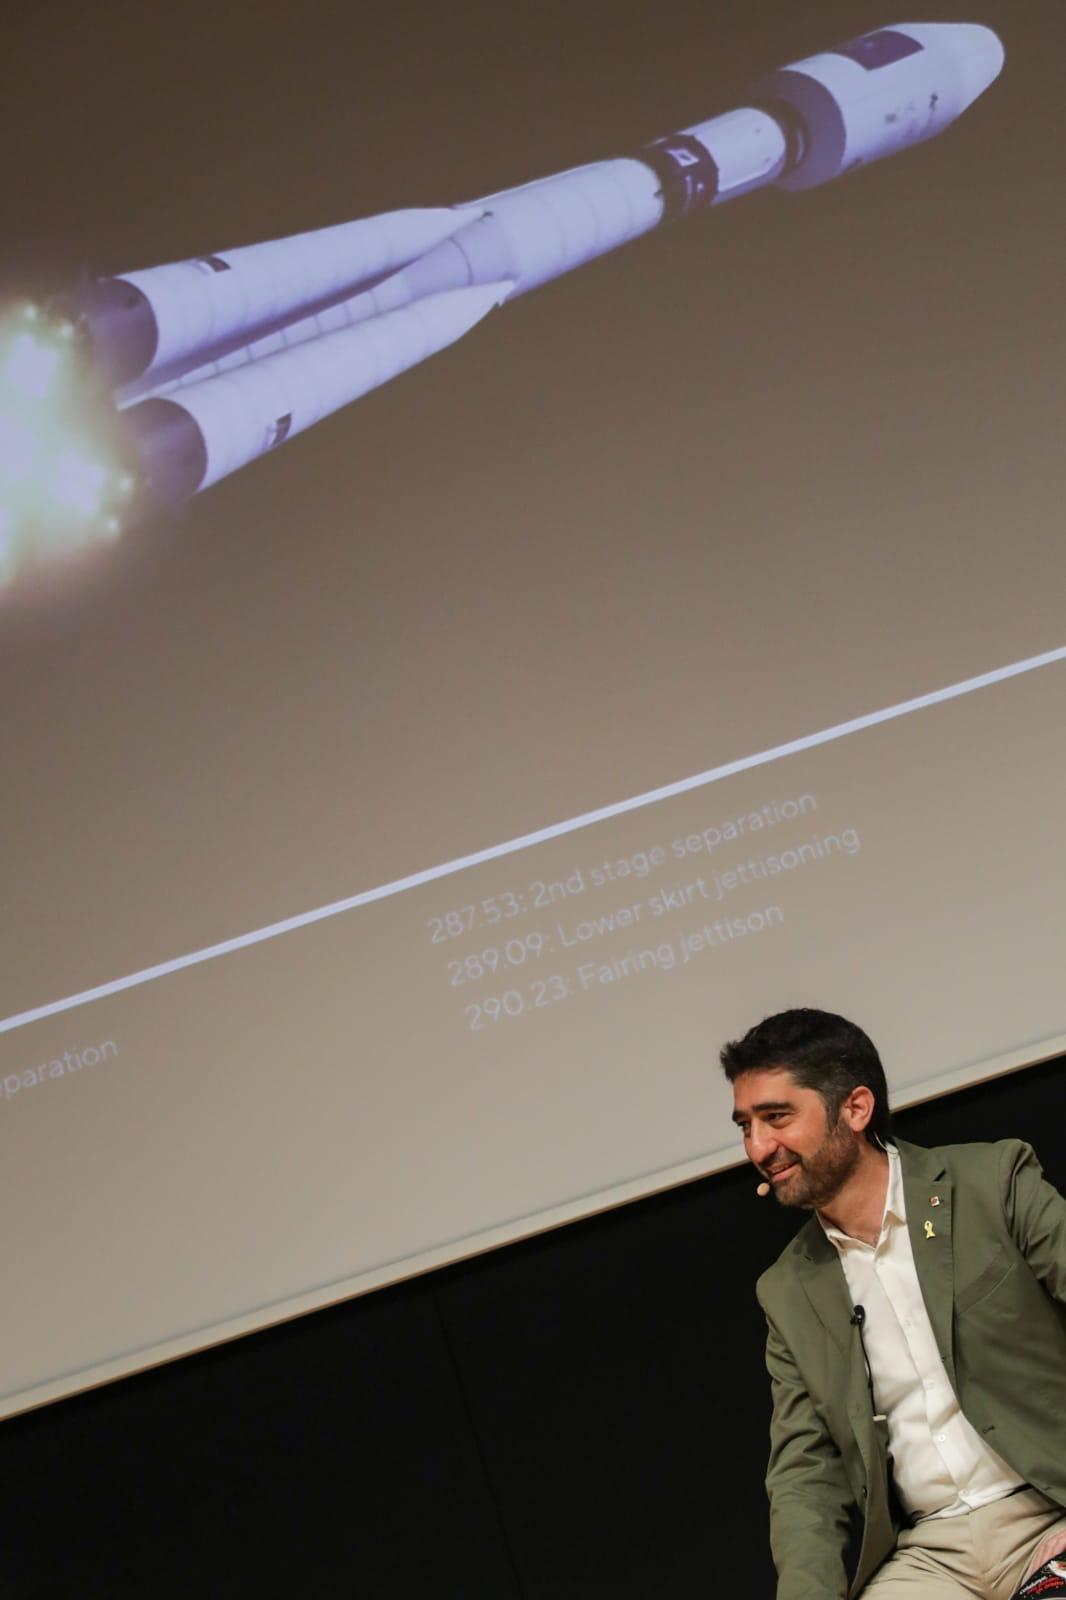 Jordi Puigneró during the launch of the nanosatellite 'Enxaneta'.